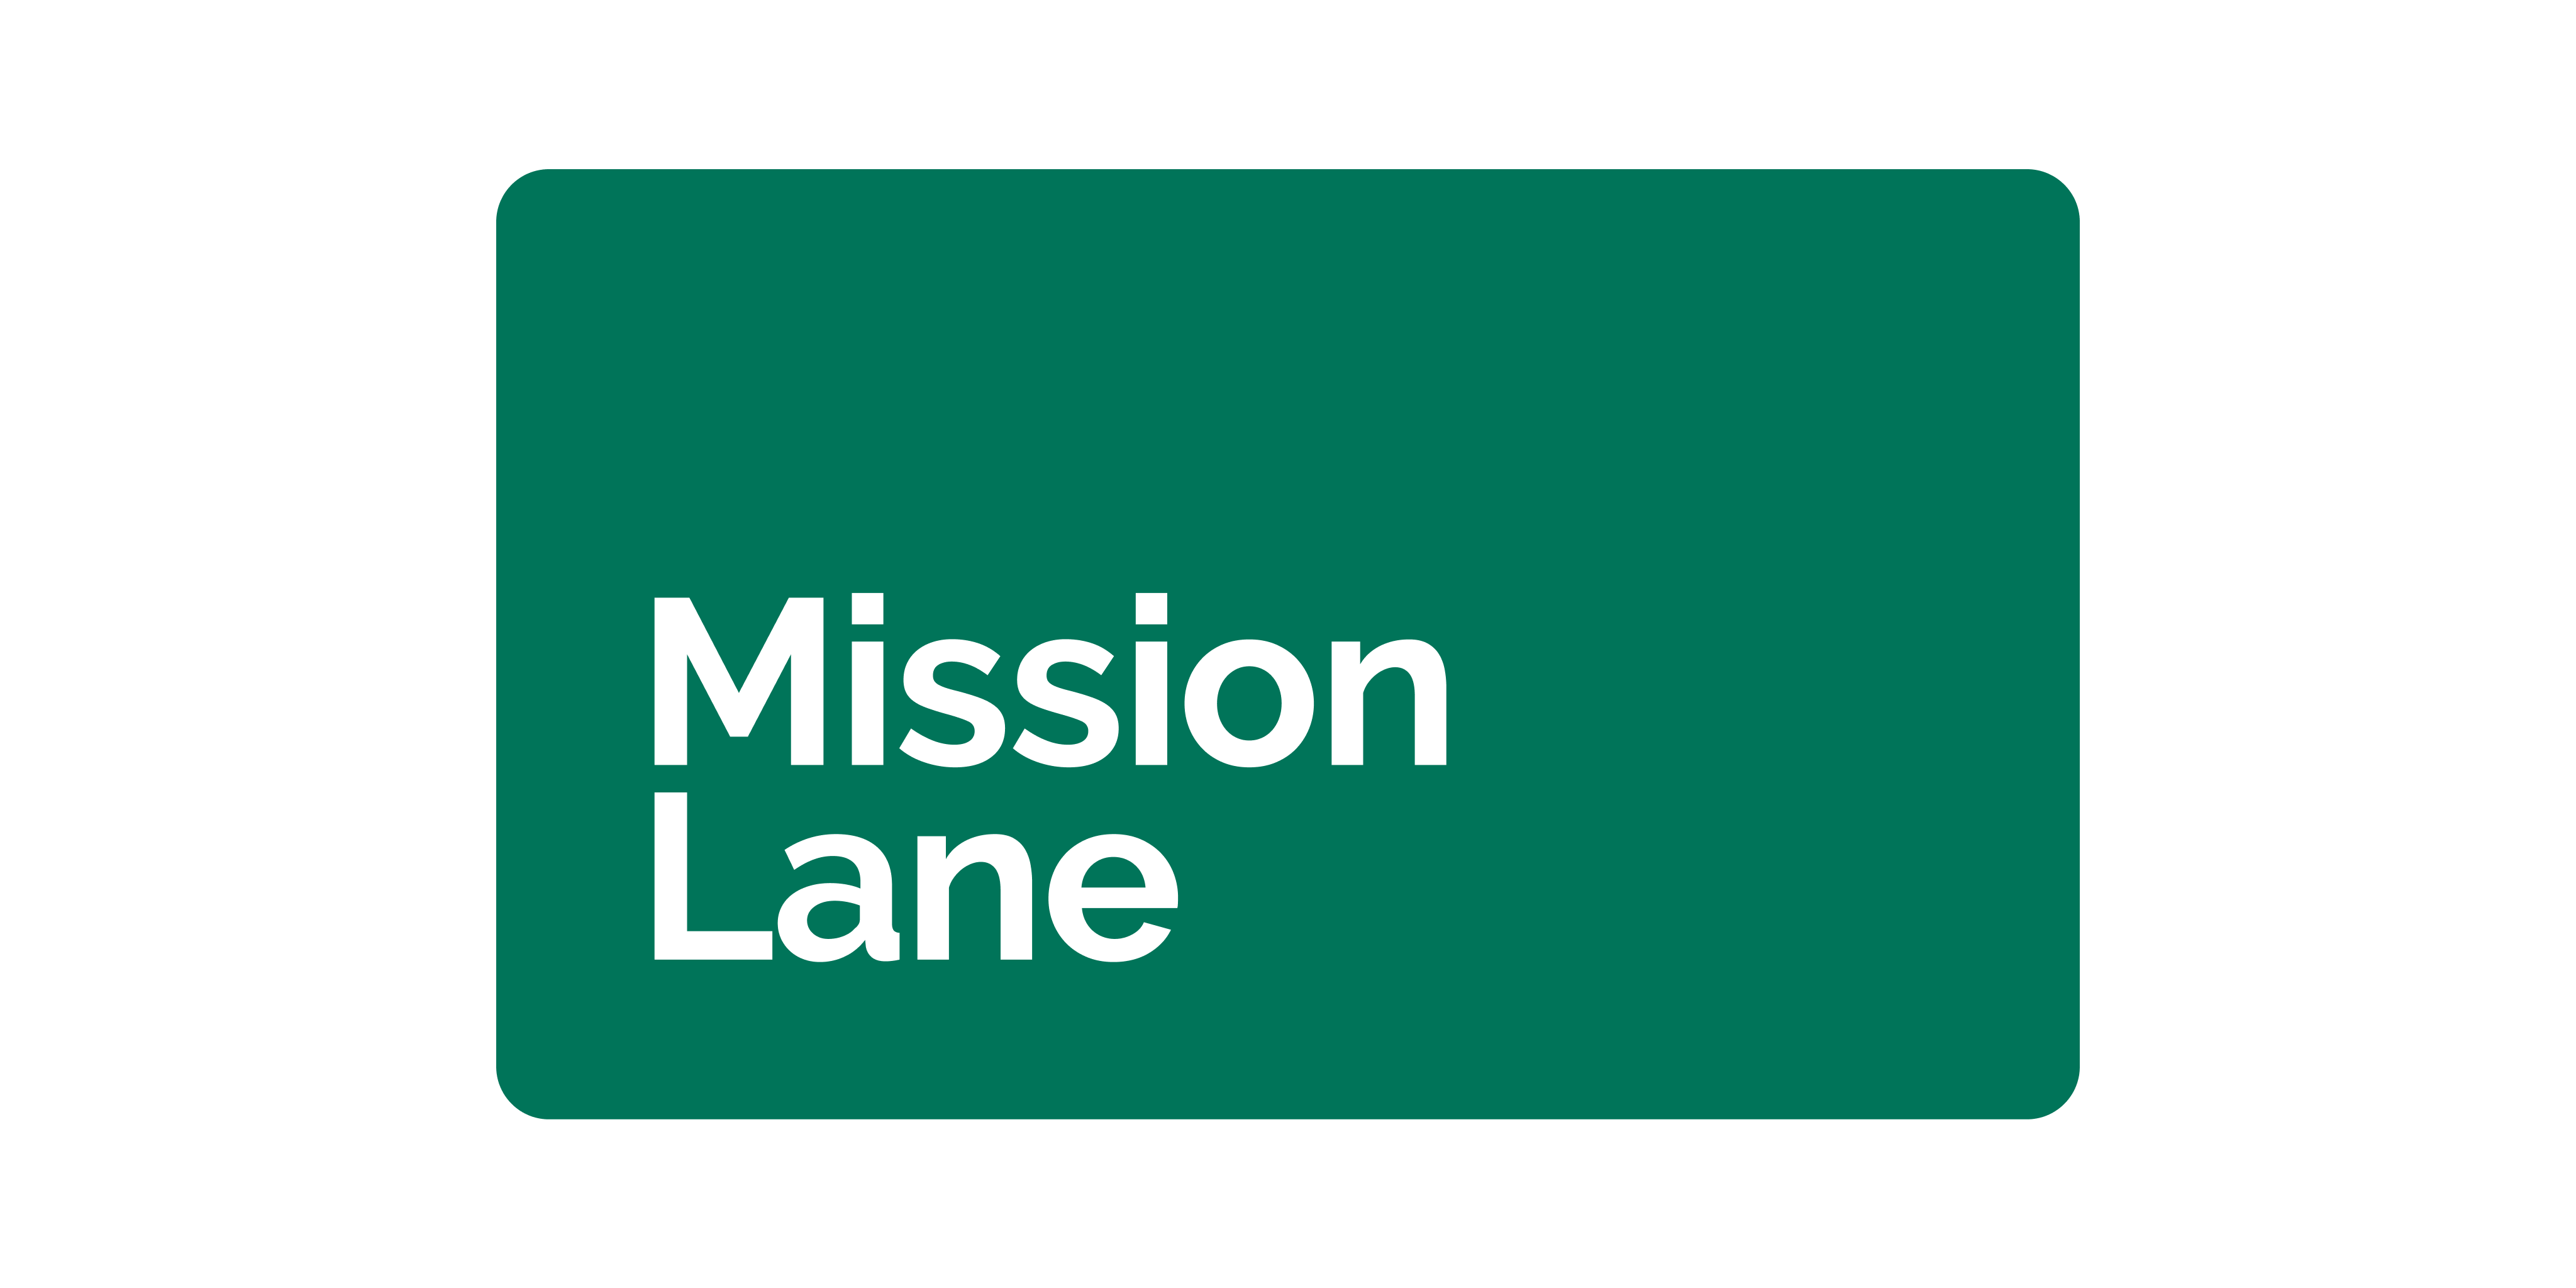 Decorative, Mission Lane logo